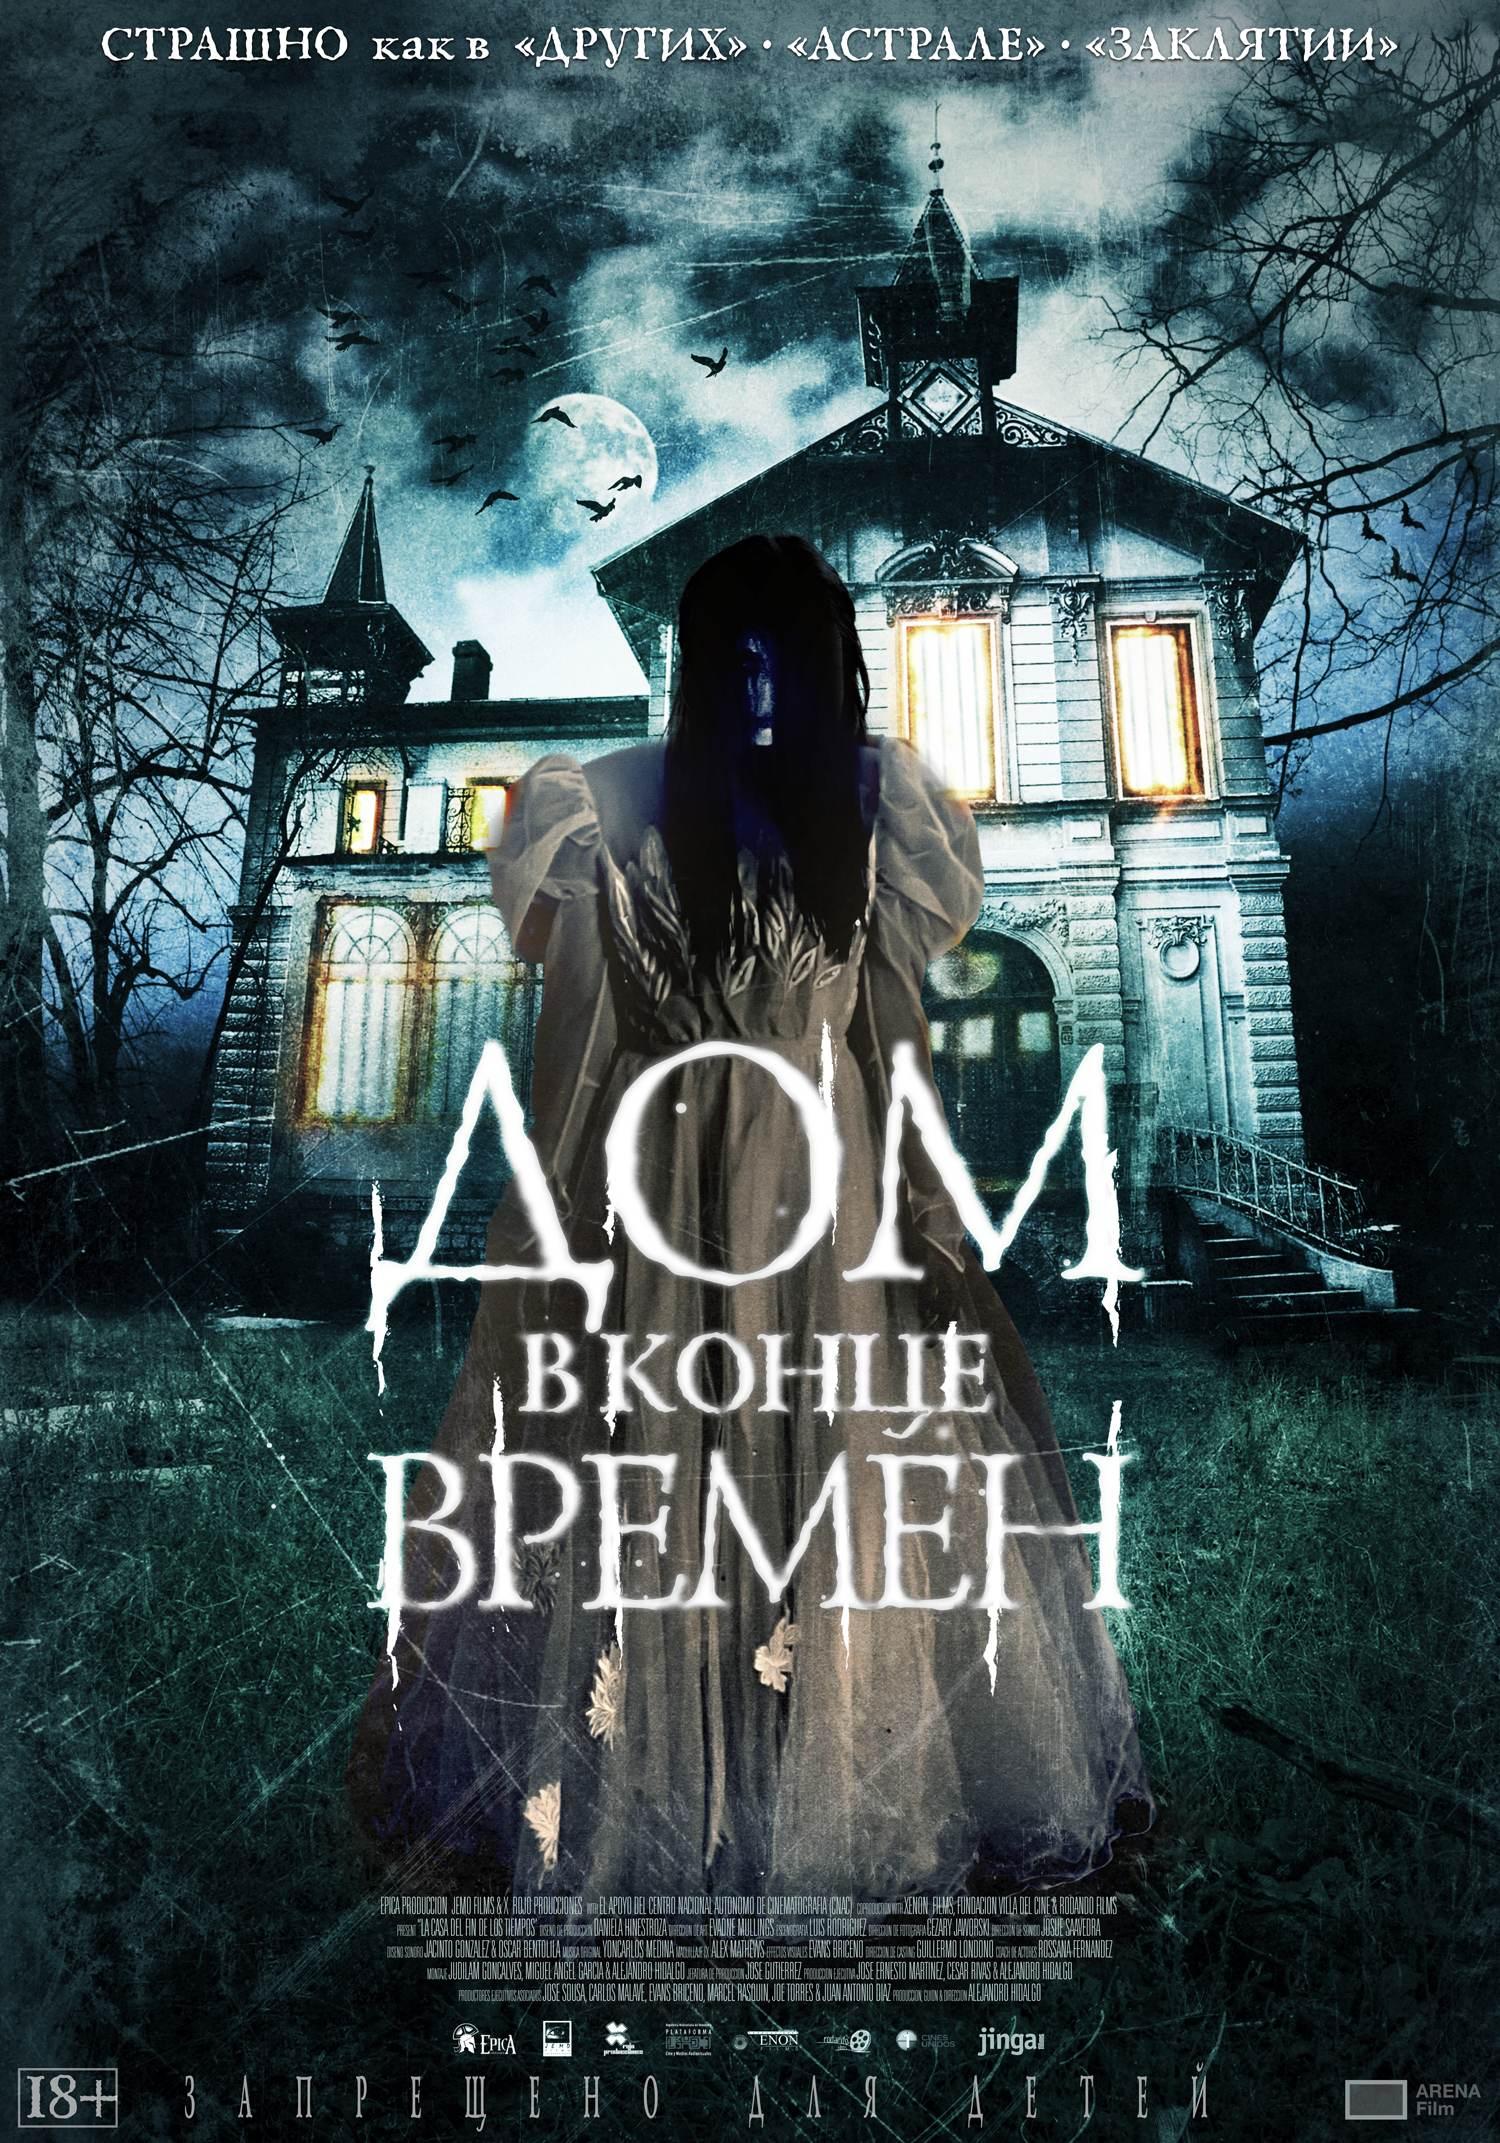 http://st-im.kinopoisk.ru/im/poster/2/5/8/kinopoisk.ru-La-casa-del-fin-de-los-tiempos-2581165--o--.jpg